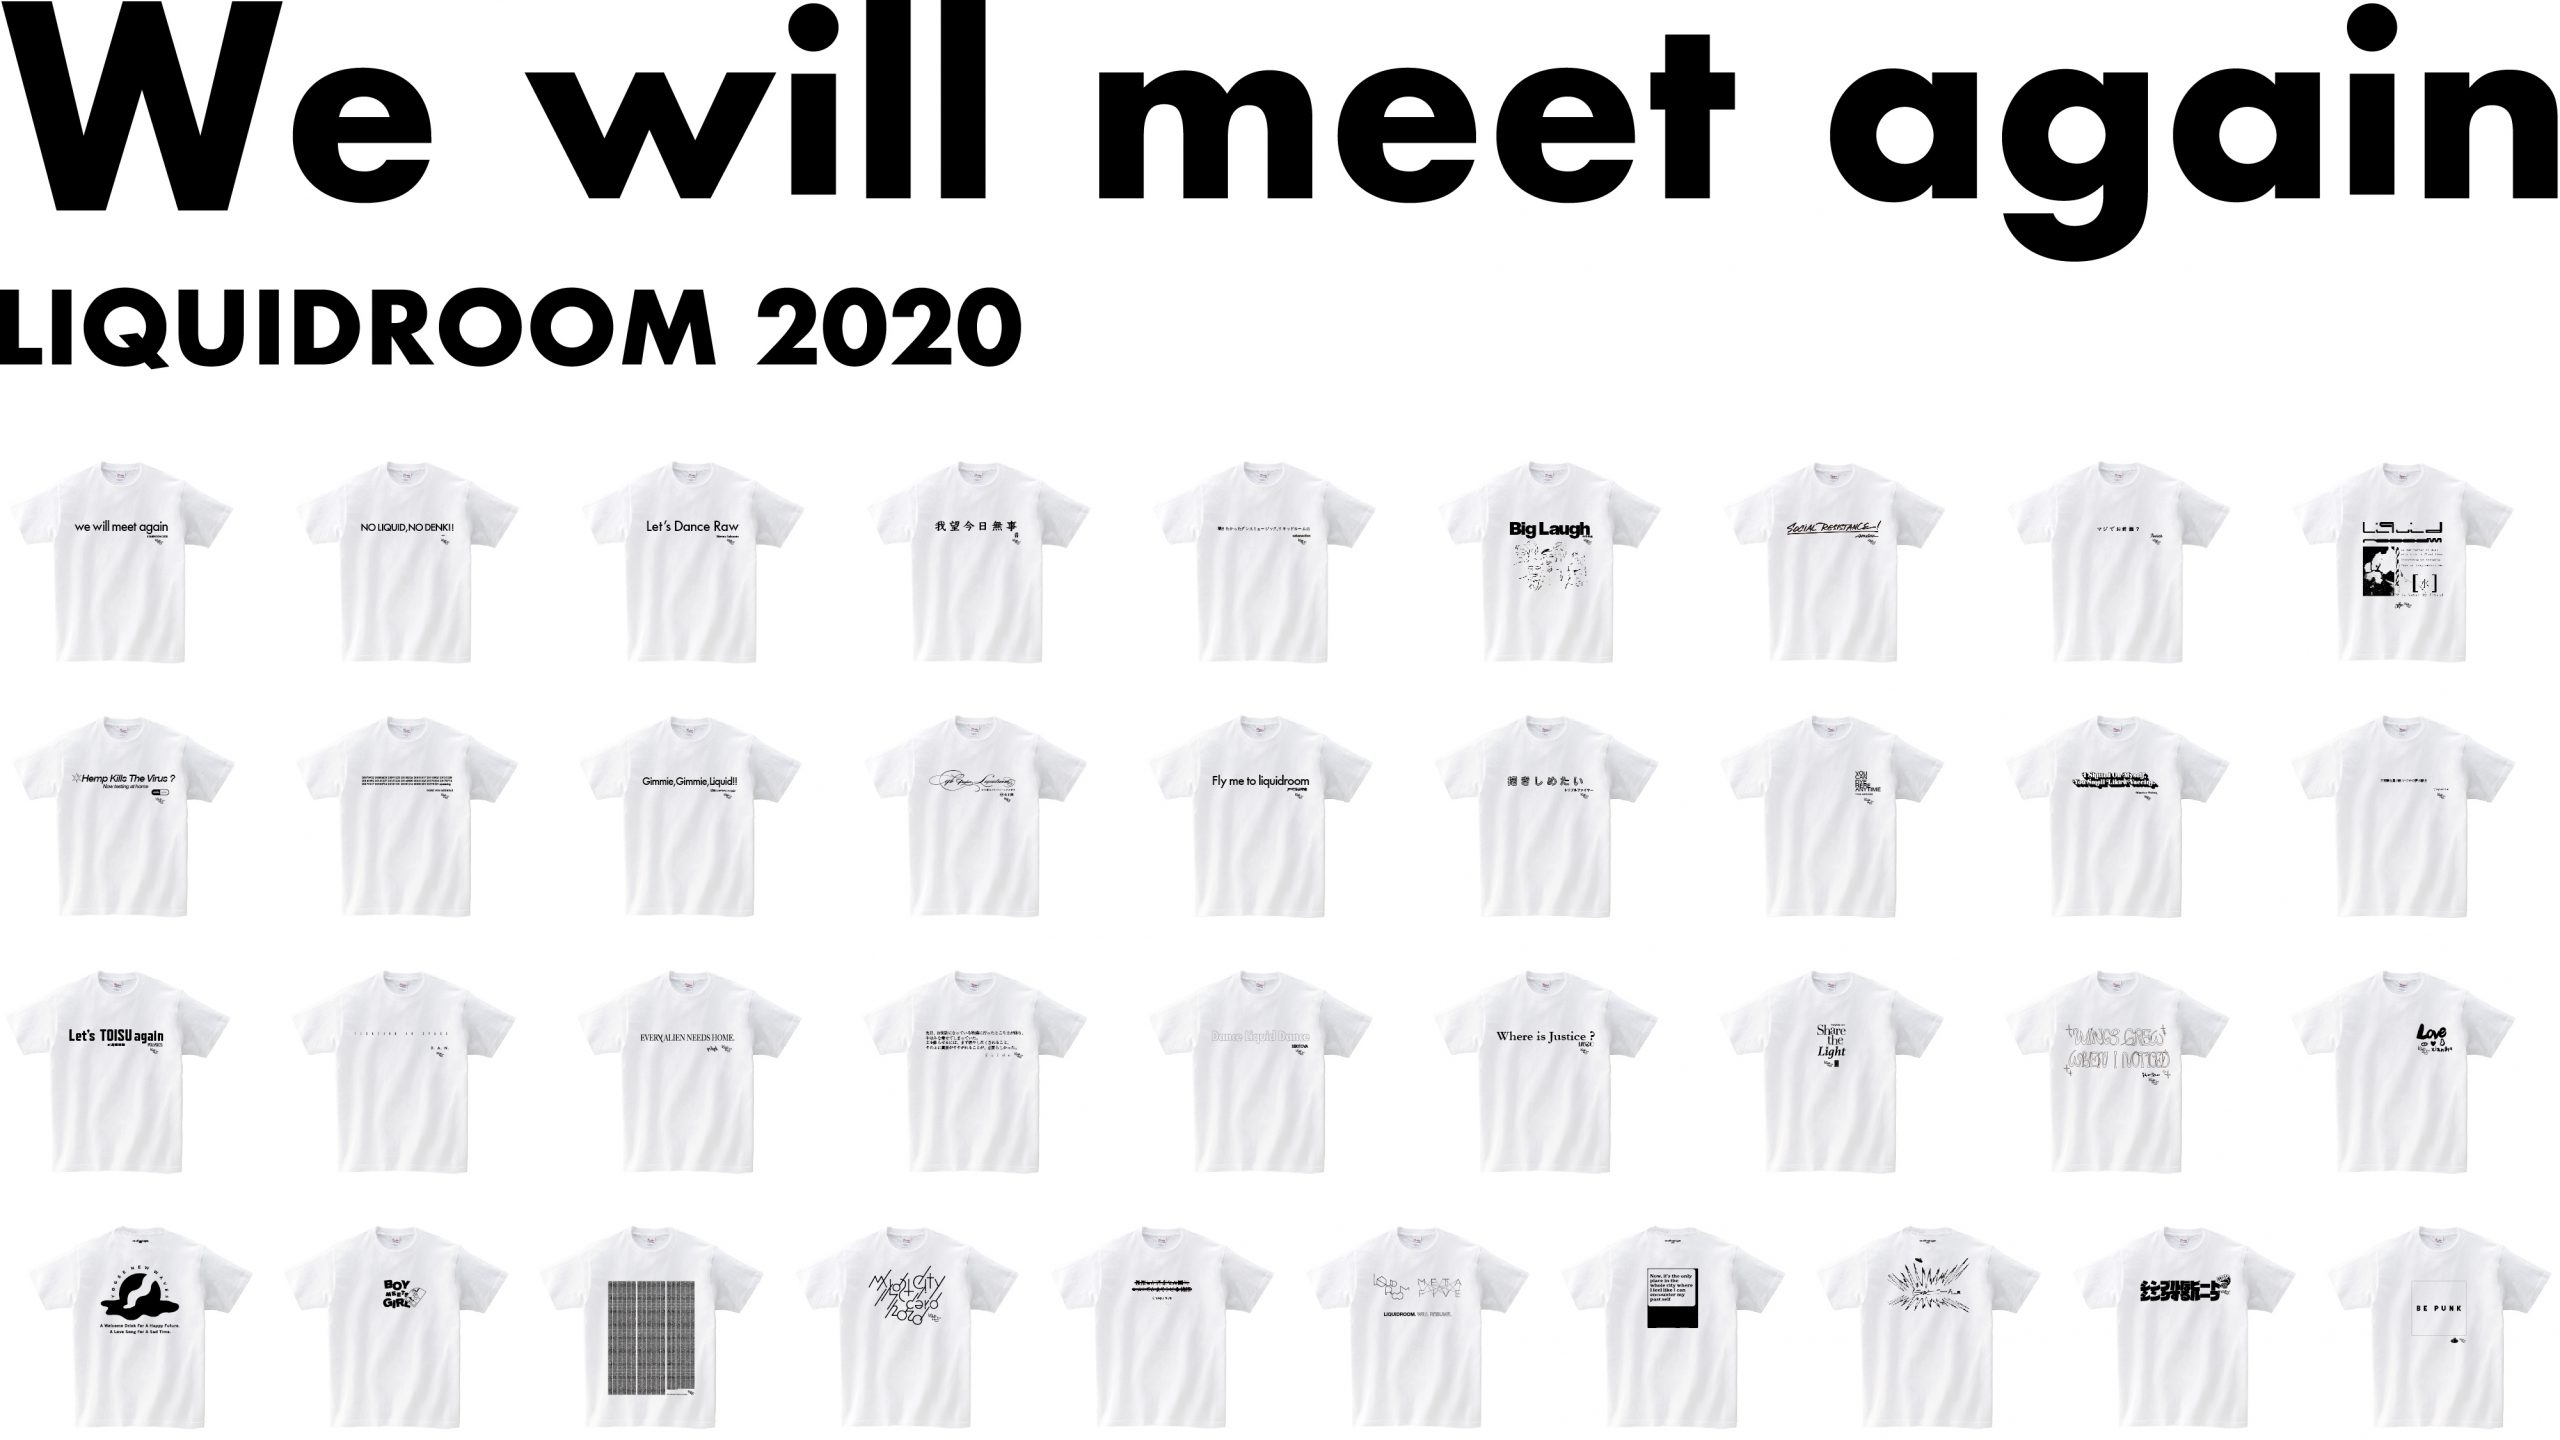 We will meet again LIQUIDROOM 2020